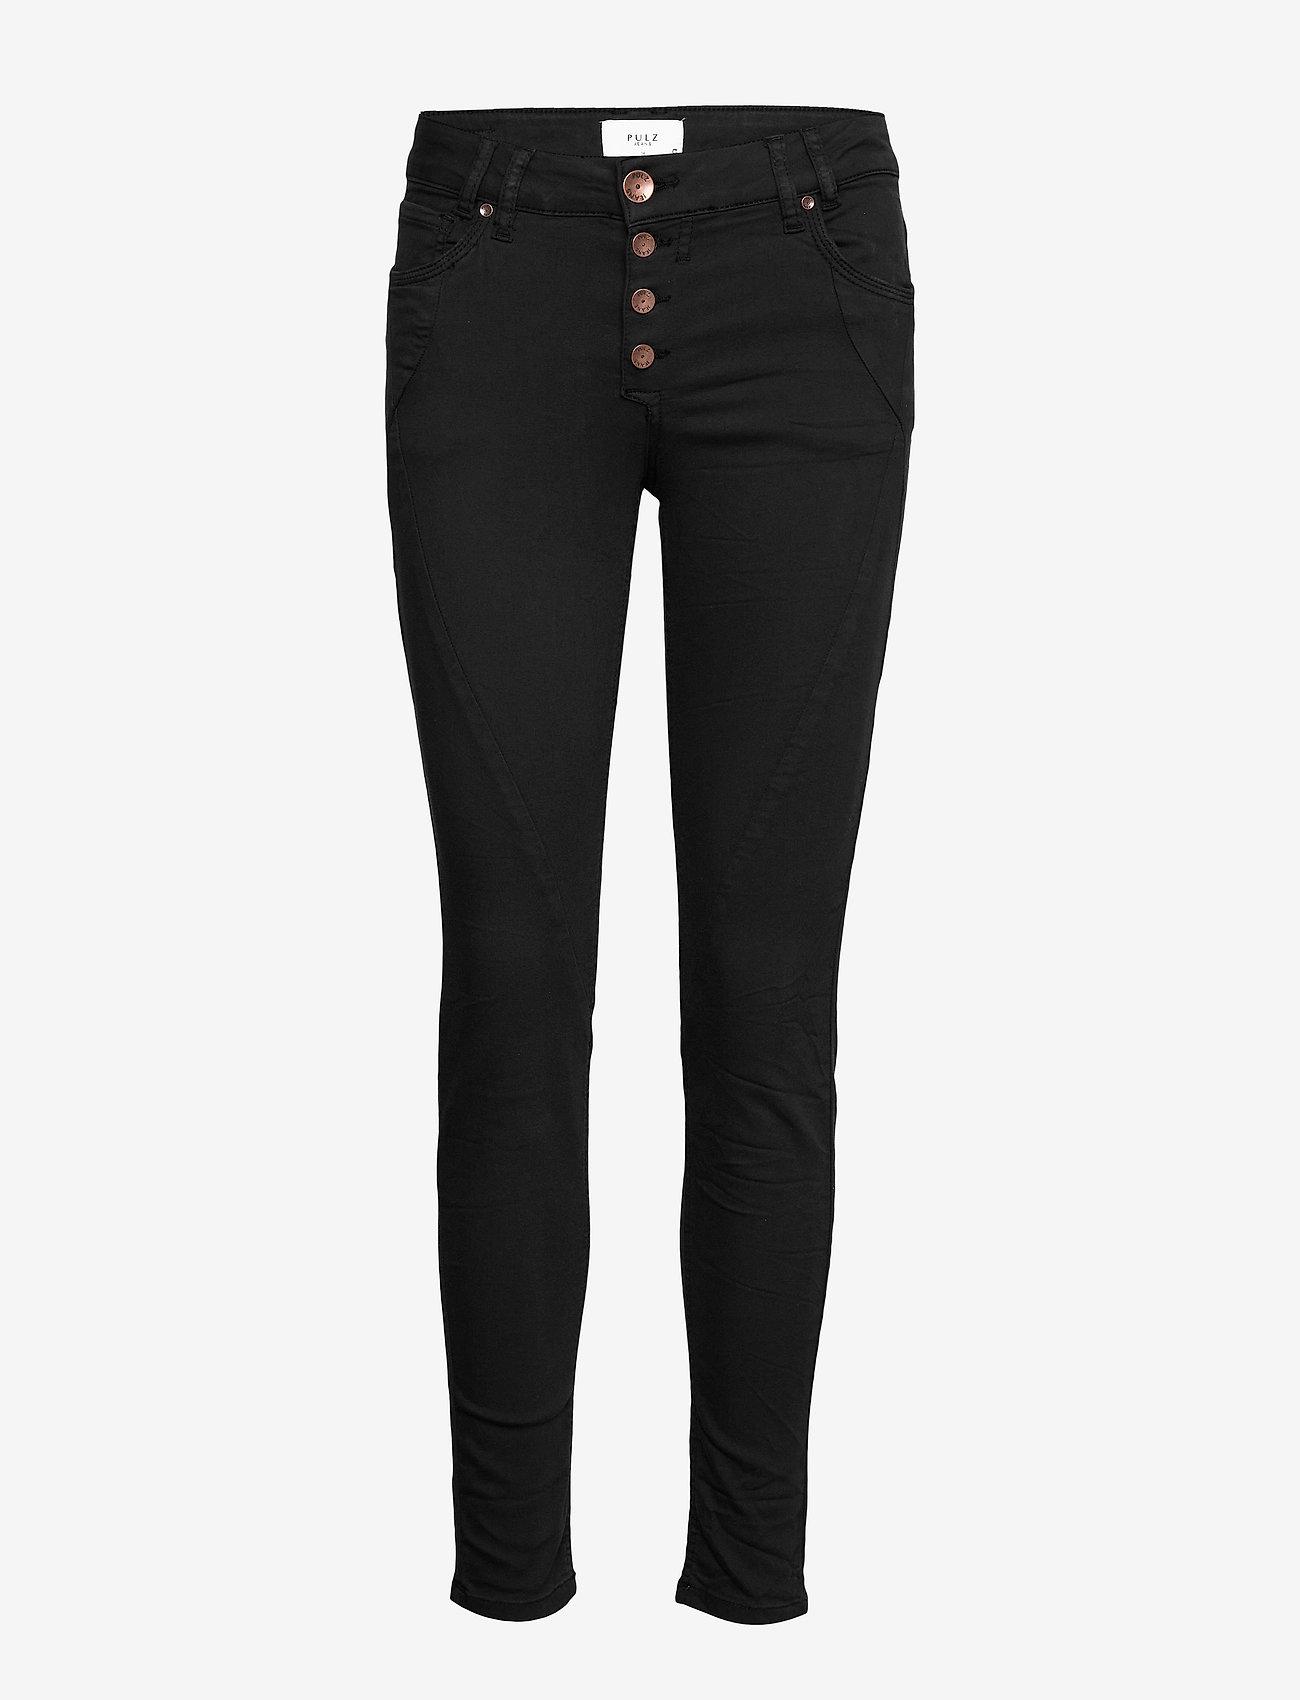 Pulz Jeans - PZROSITA PANT - skinny jeans - black beauty - 0